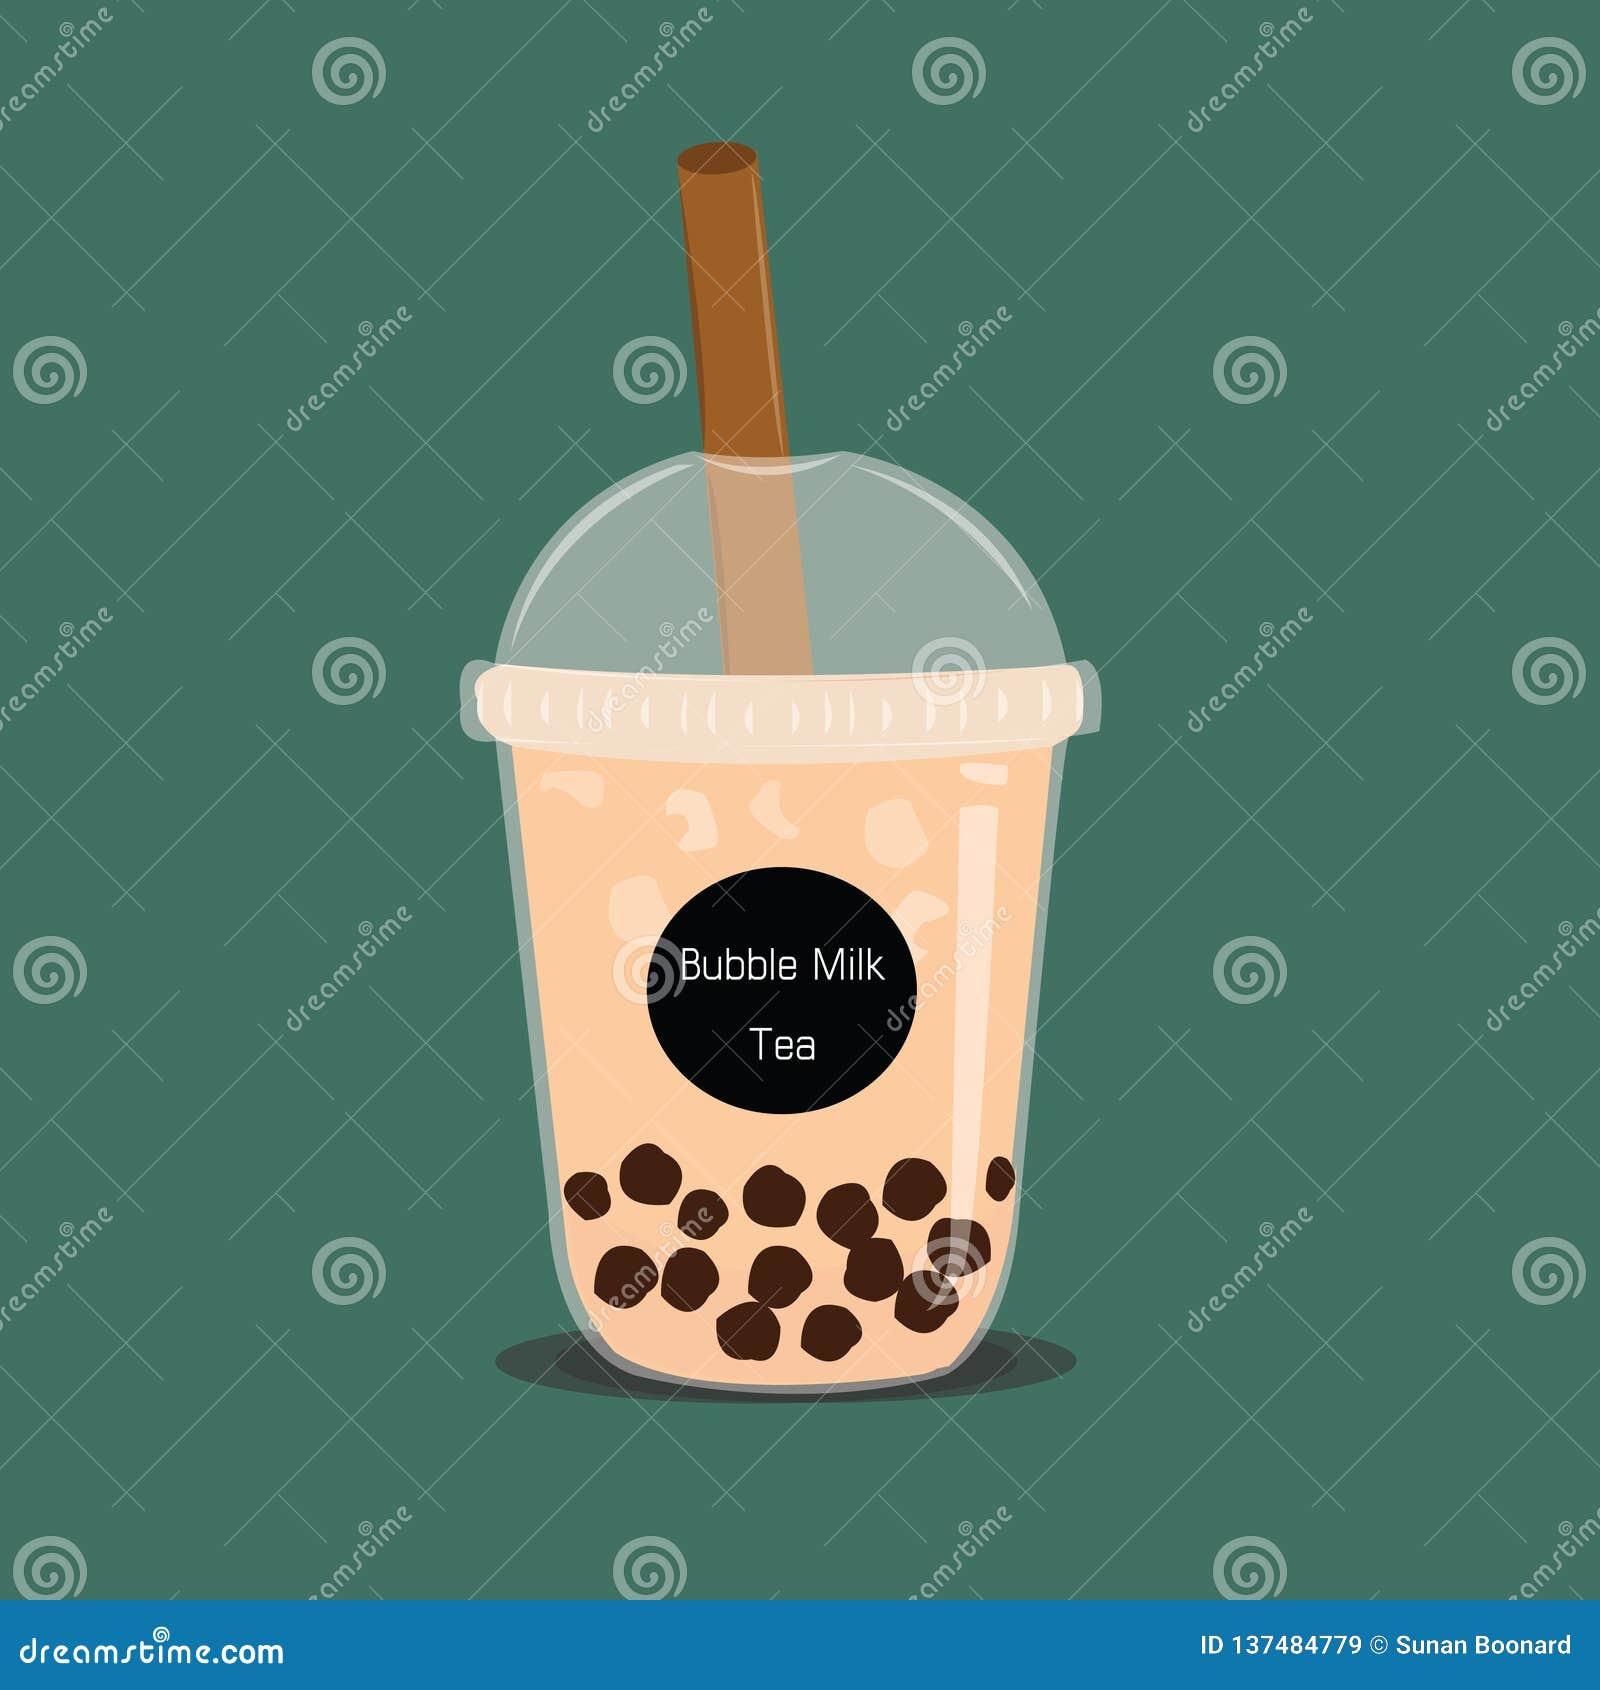 El té de la leche de la burbuja El té negro de la leche de la perla es vector grande y pequeño famoso de la bebida de la taza